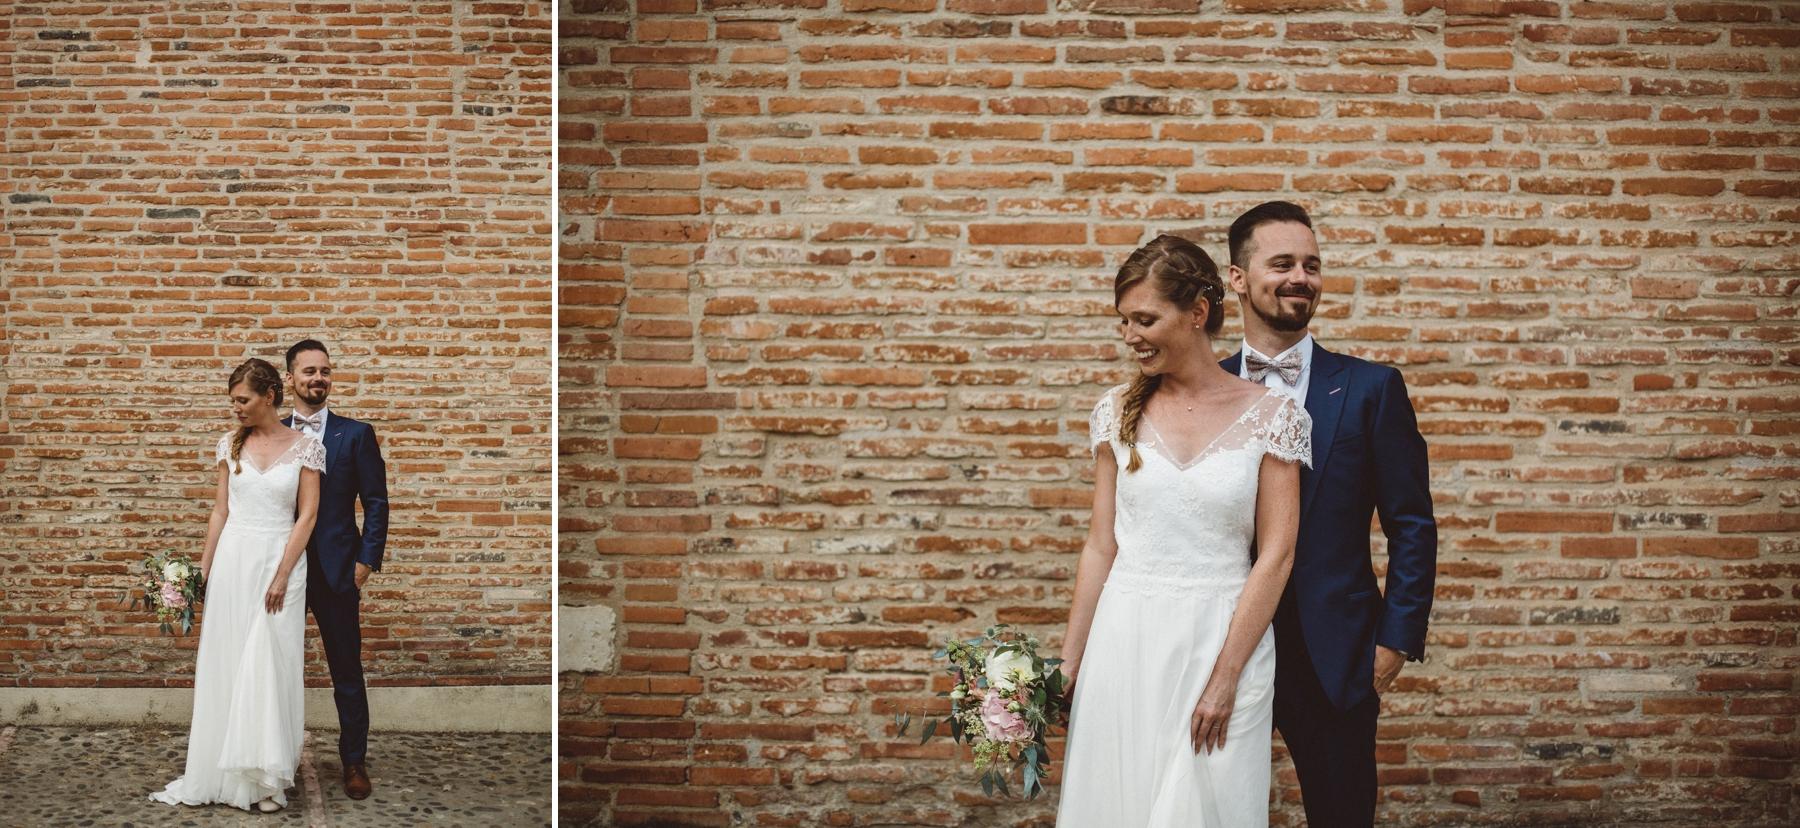 mariage-domaine-montjoie-toulouse_0041.jpg